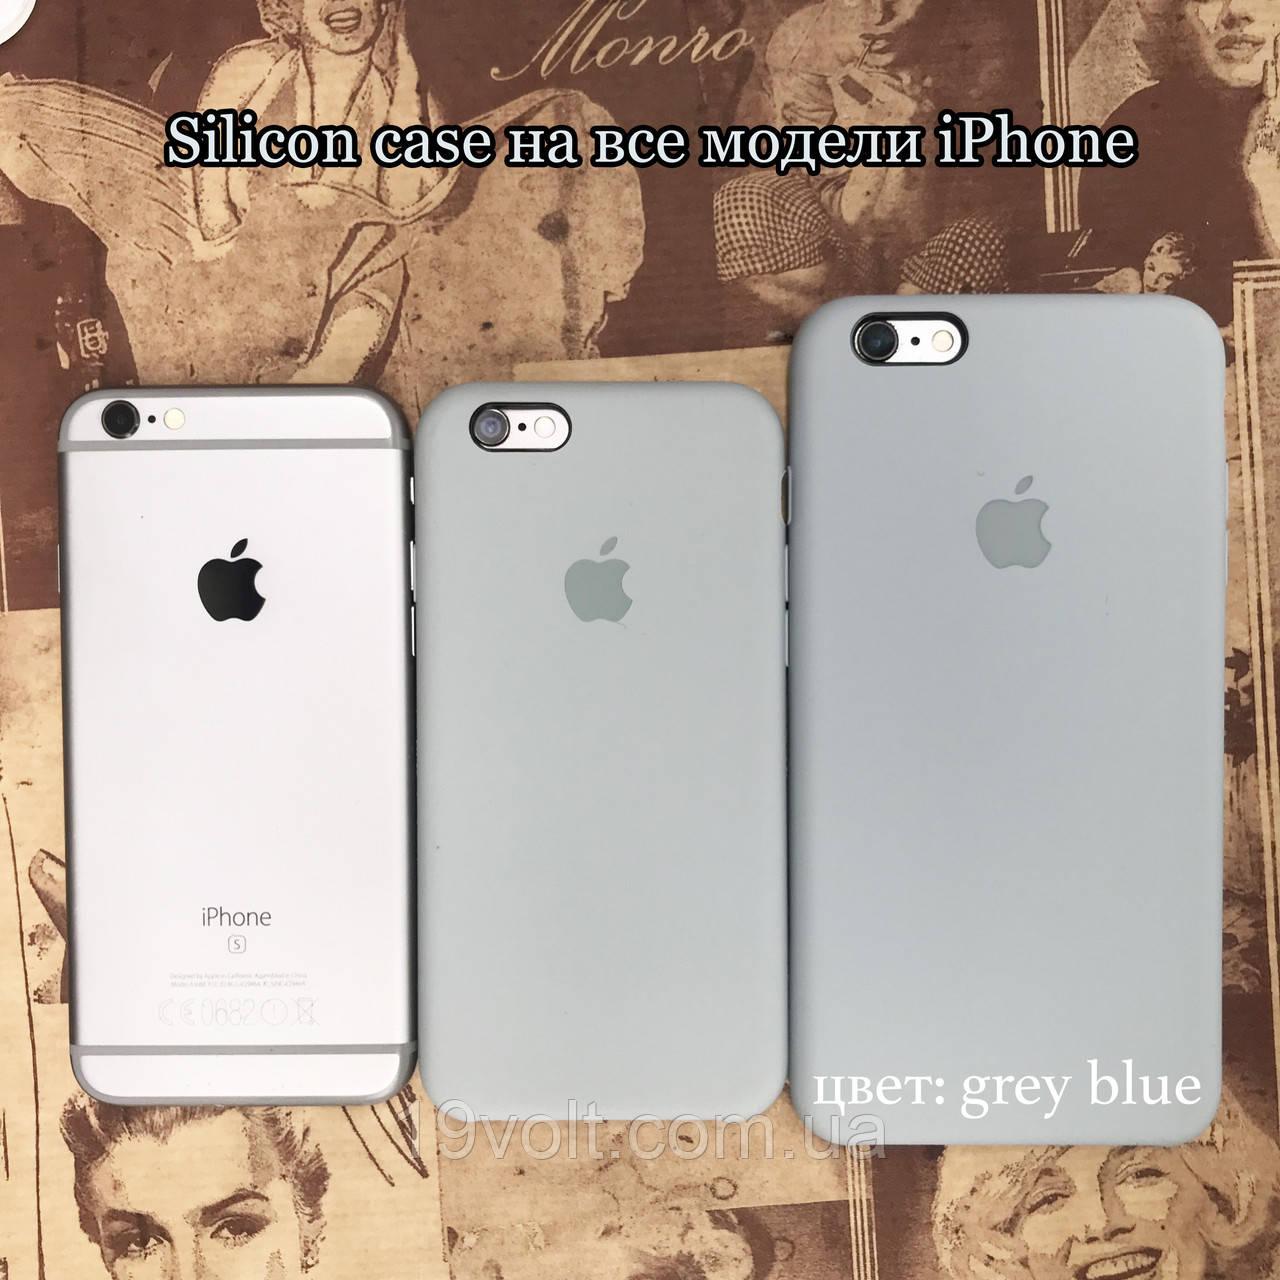 Силиконовый чехол Apple Silicone Case iPhone 6, 6s; 7, 7 plus; 8, 8 plus; (Grey blue)